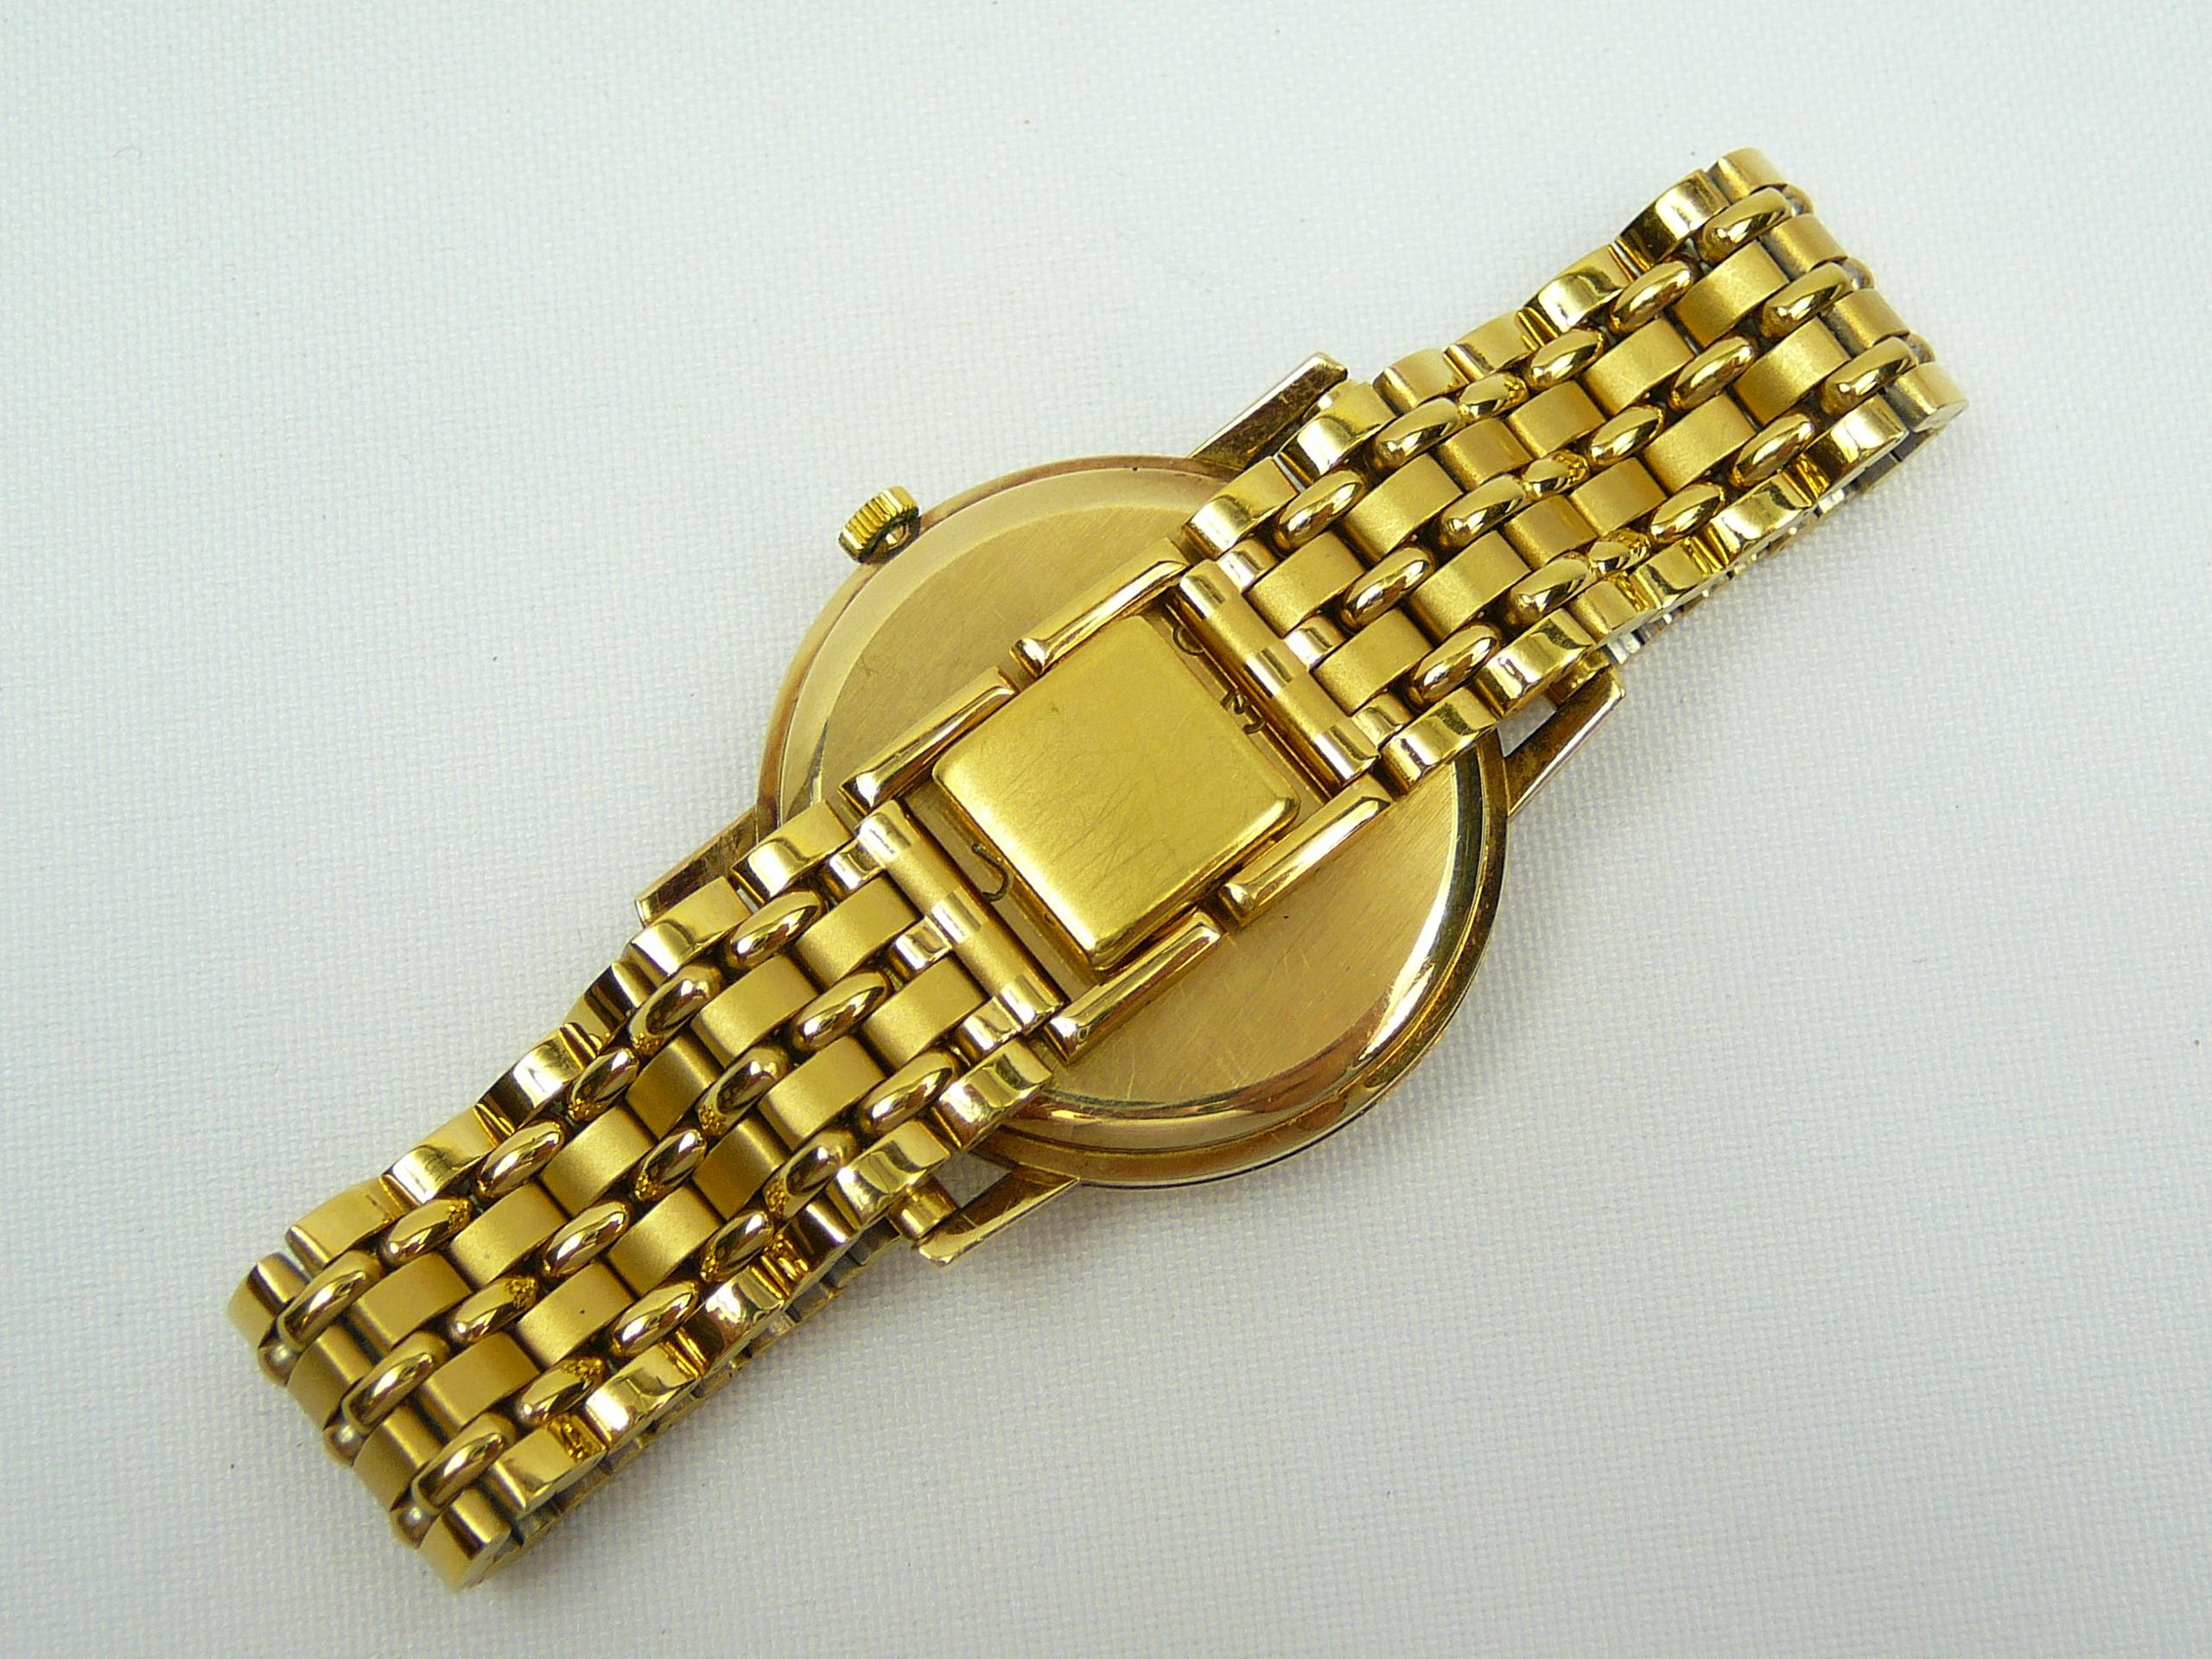 Gents Vintage Gold Longines Wrist Watch - Image 3 of 5